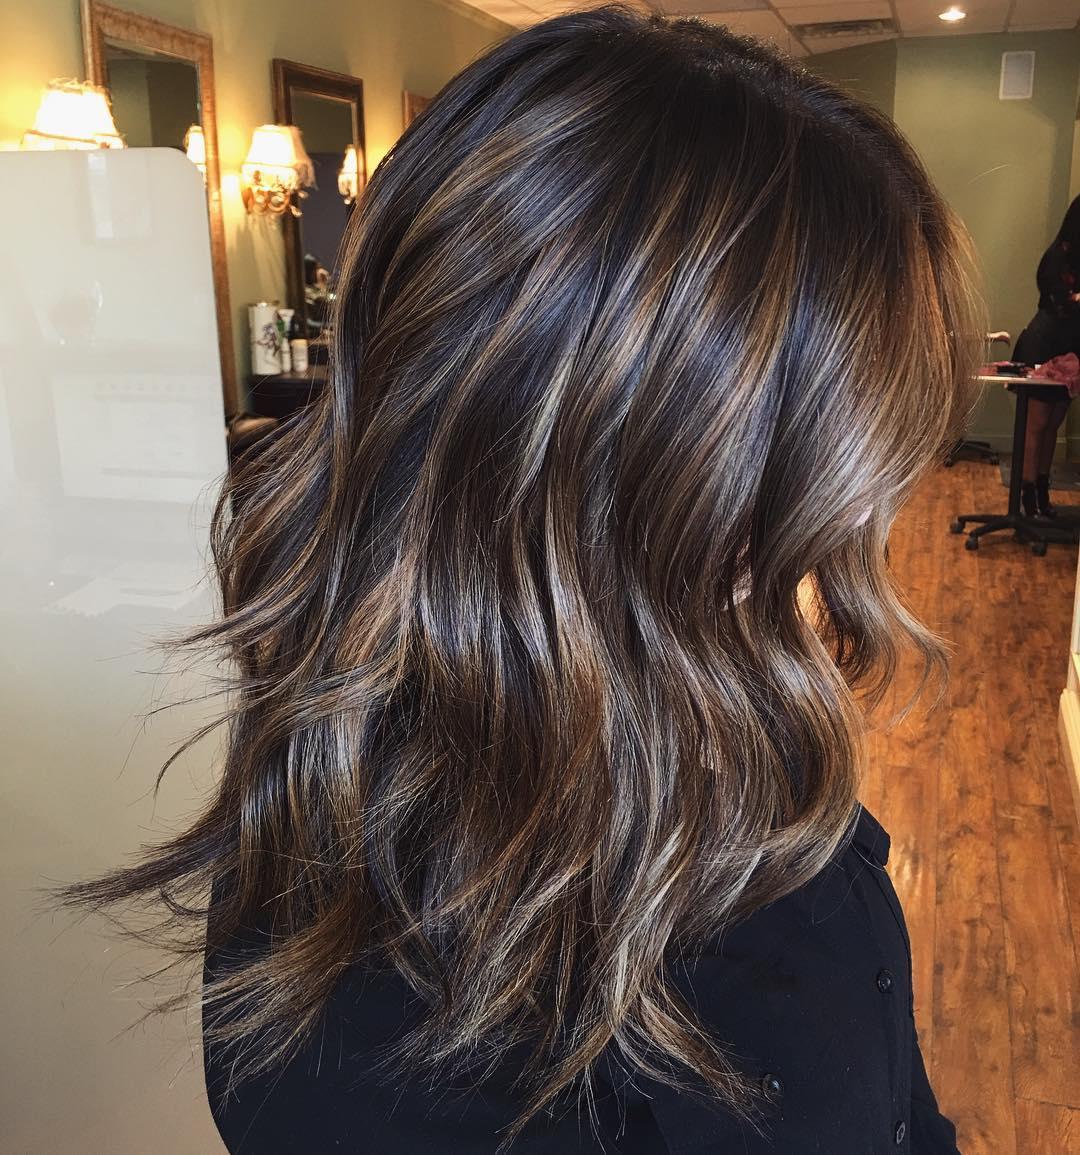 Medium Dark Hair with Caramel Highlights